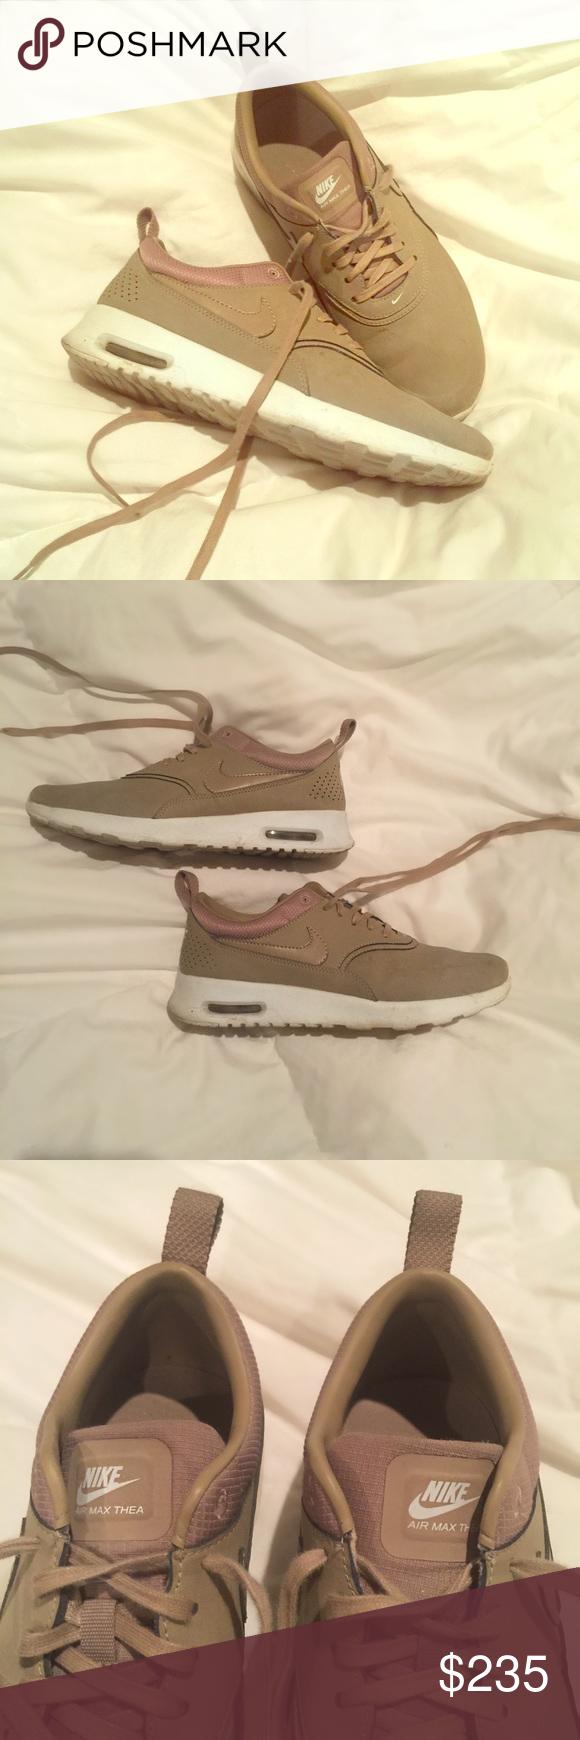 Nike Air Max Thea Premium Desert Camo EUC Size 7.5 Kendall